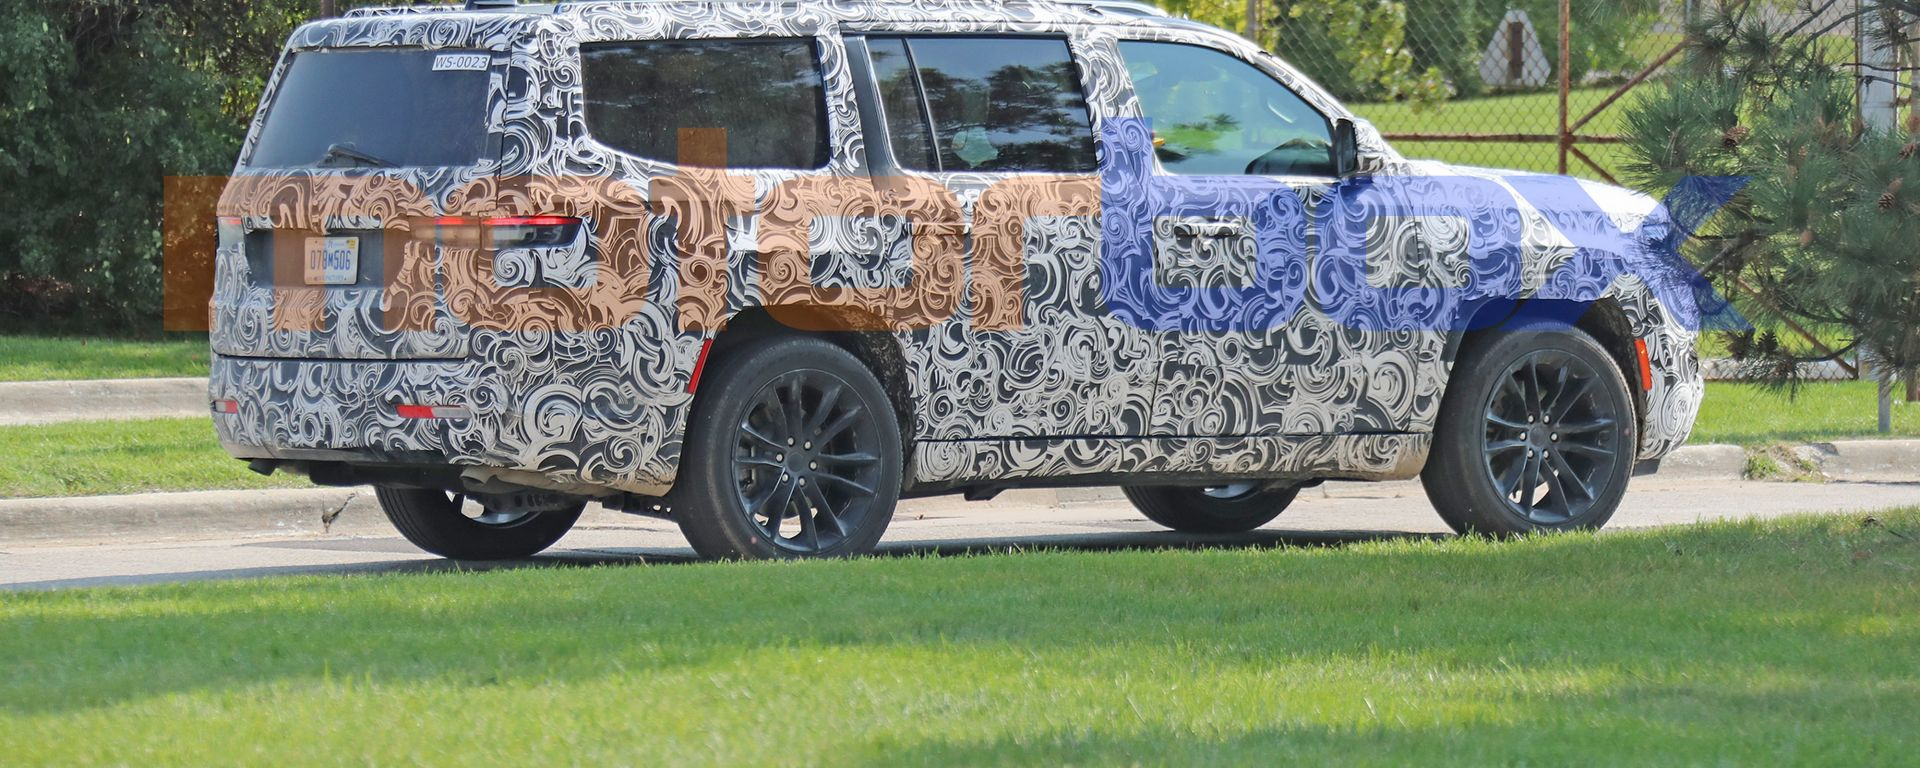 Nuova Jeep Grand Wagoneer, foto spia